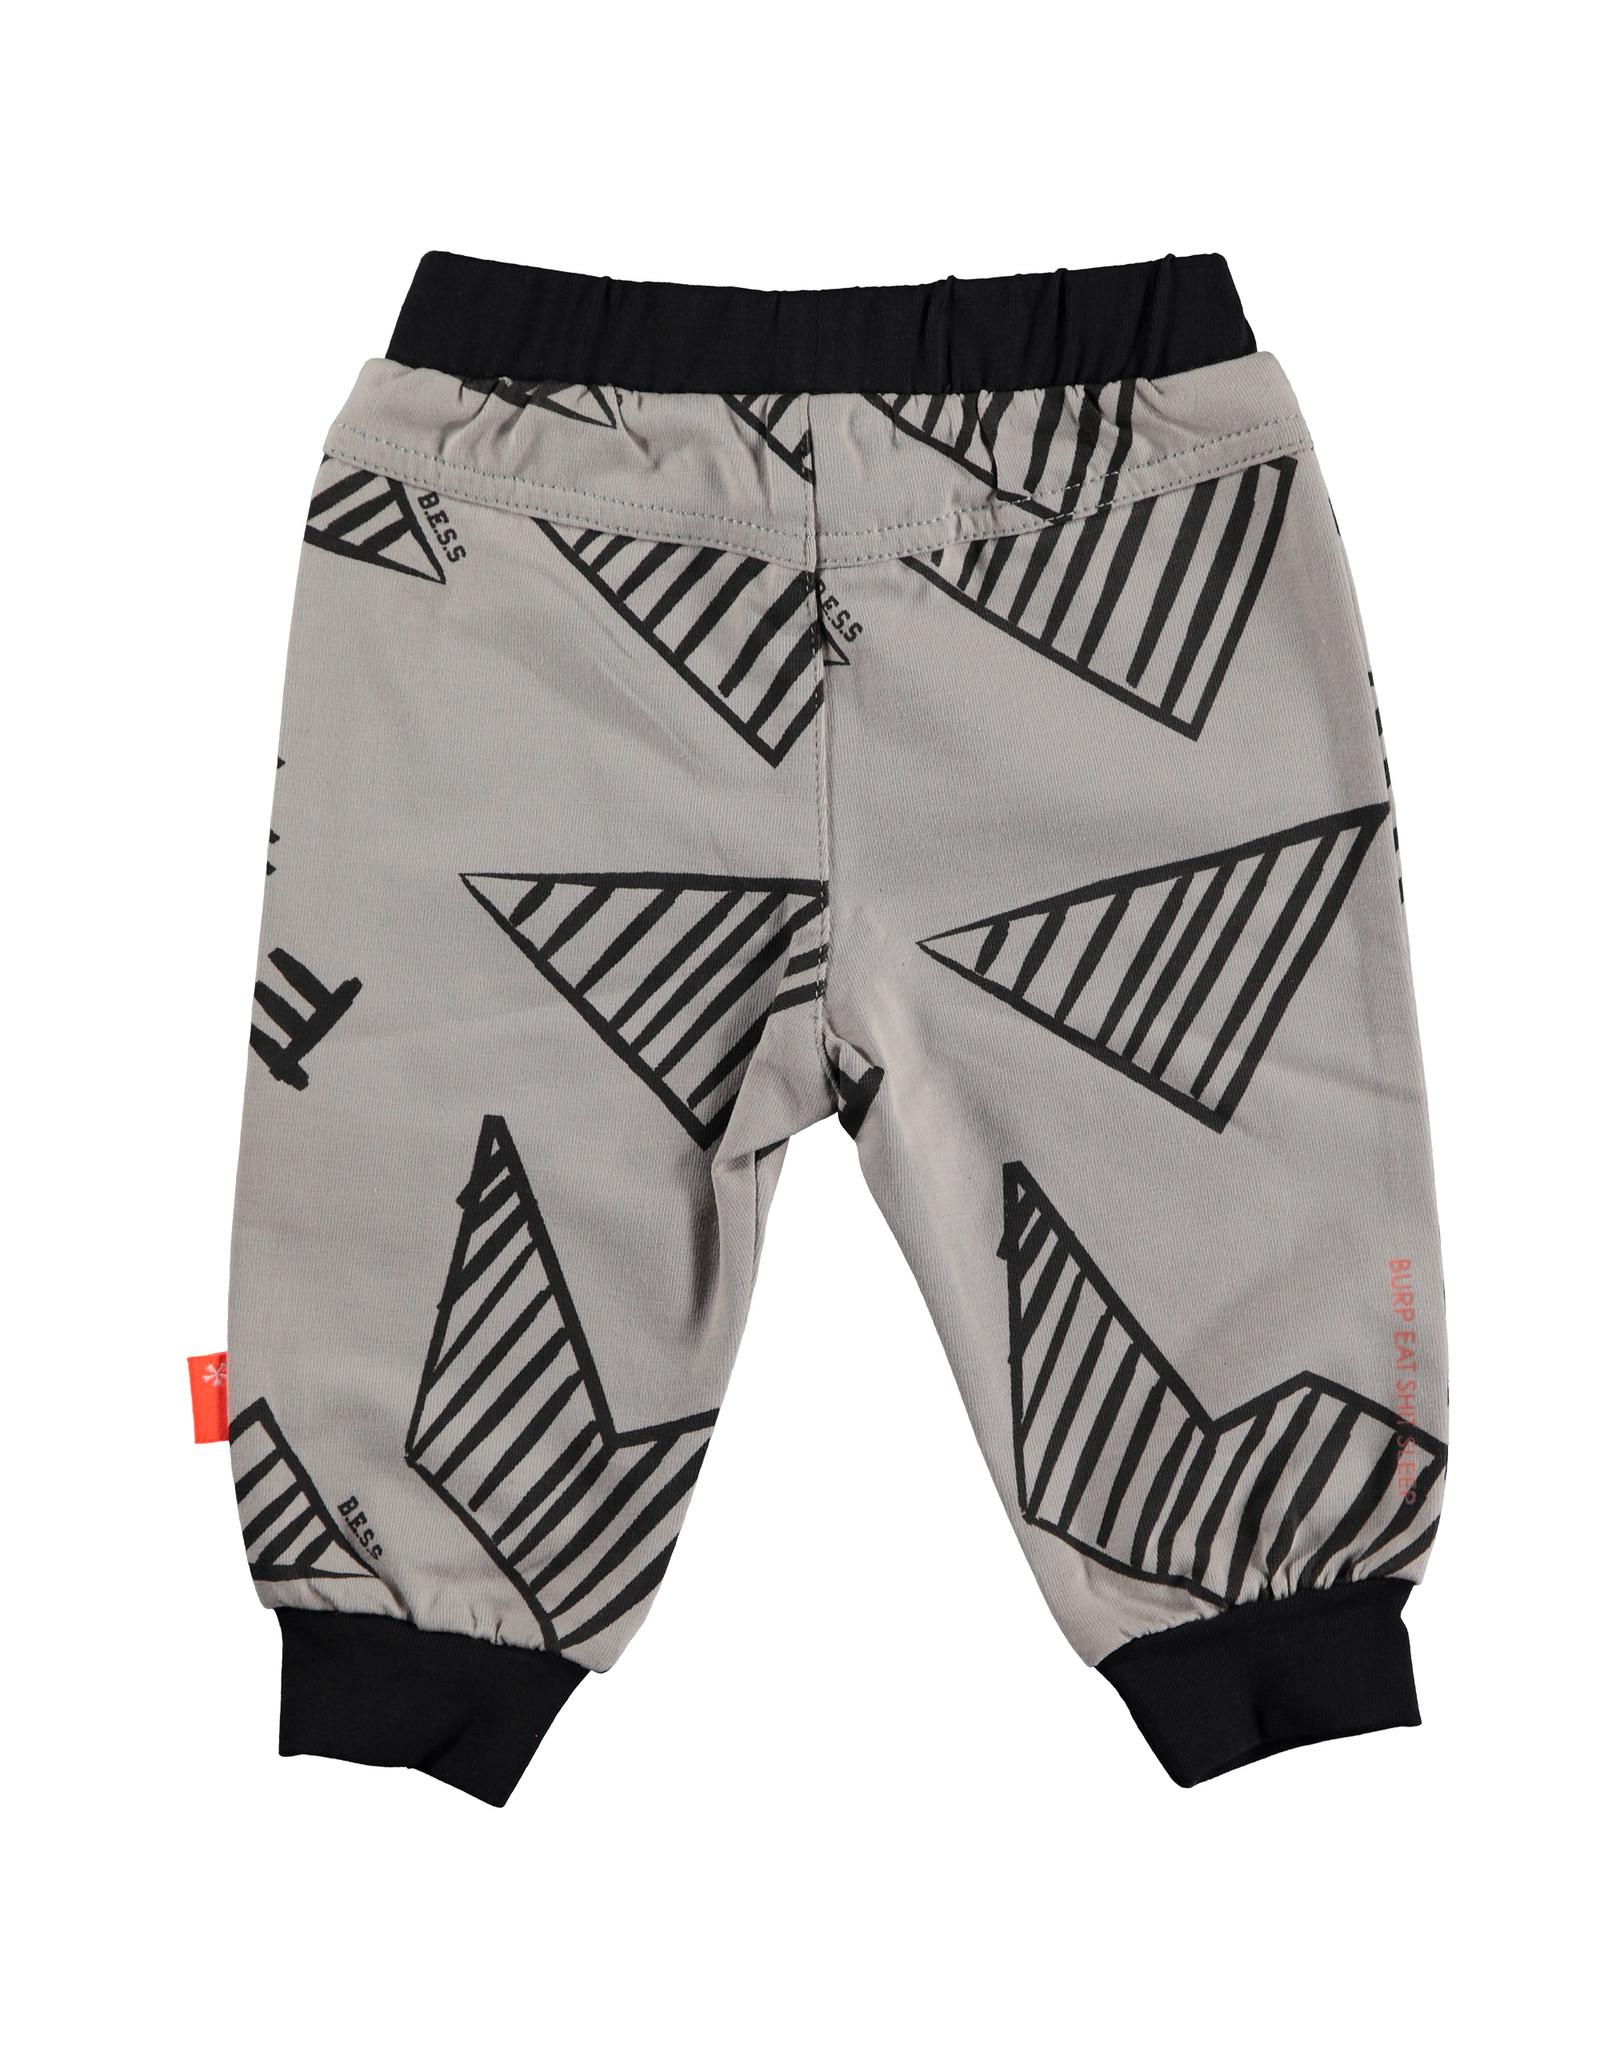 B.E.S.S. Pants Graphic, Grey